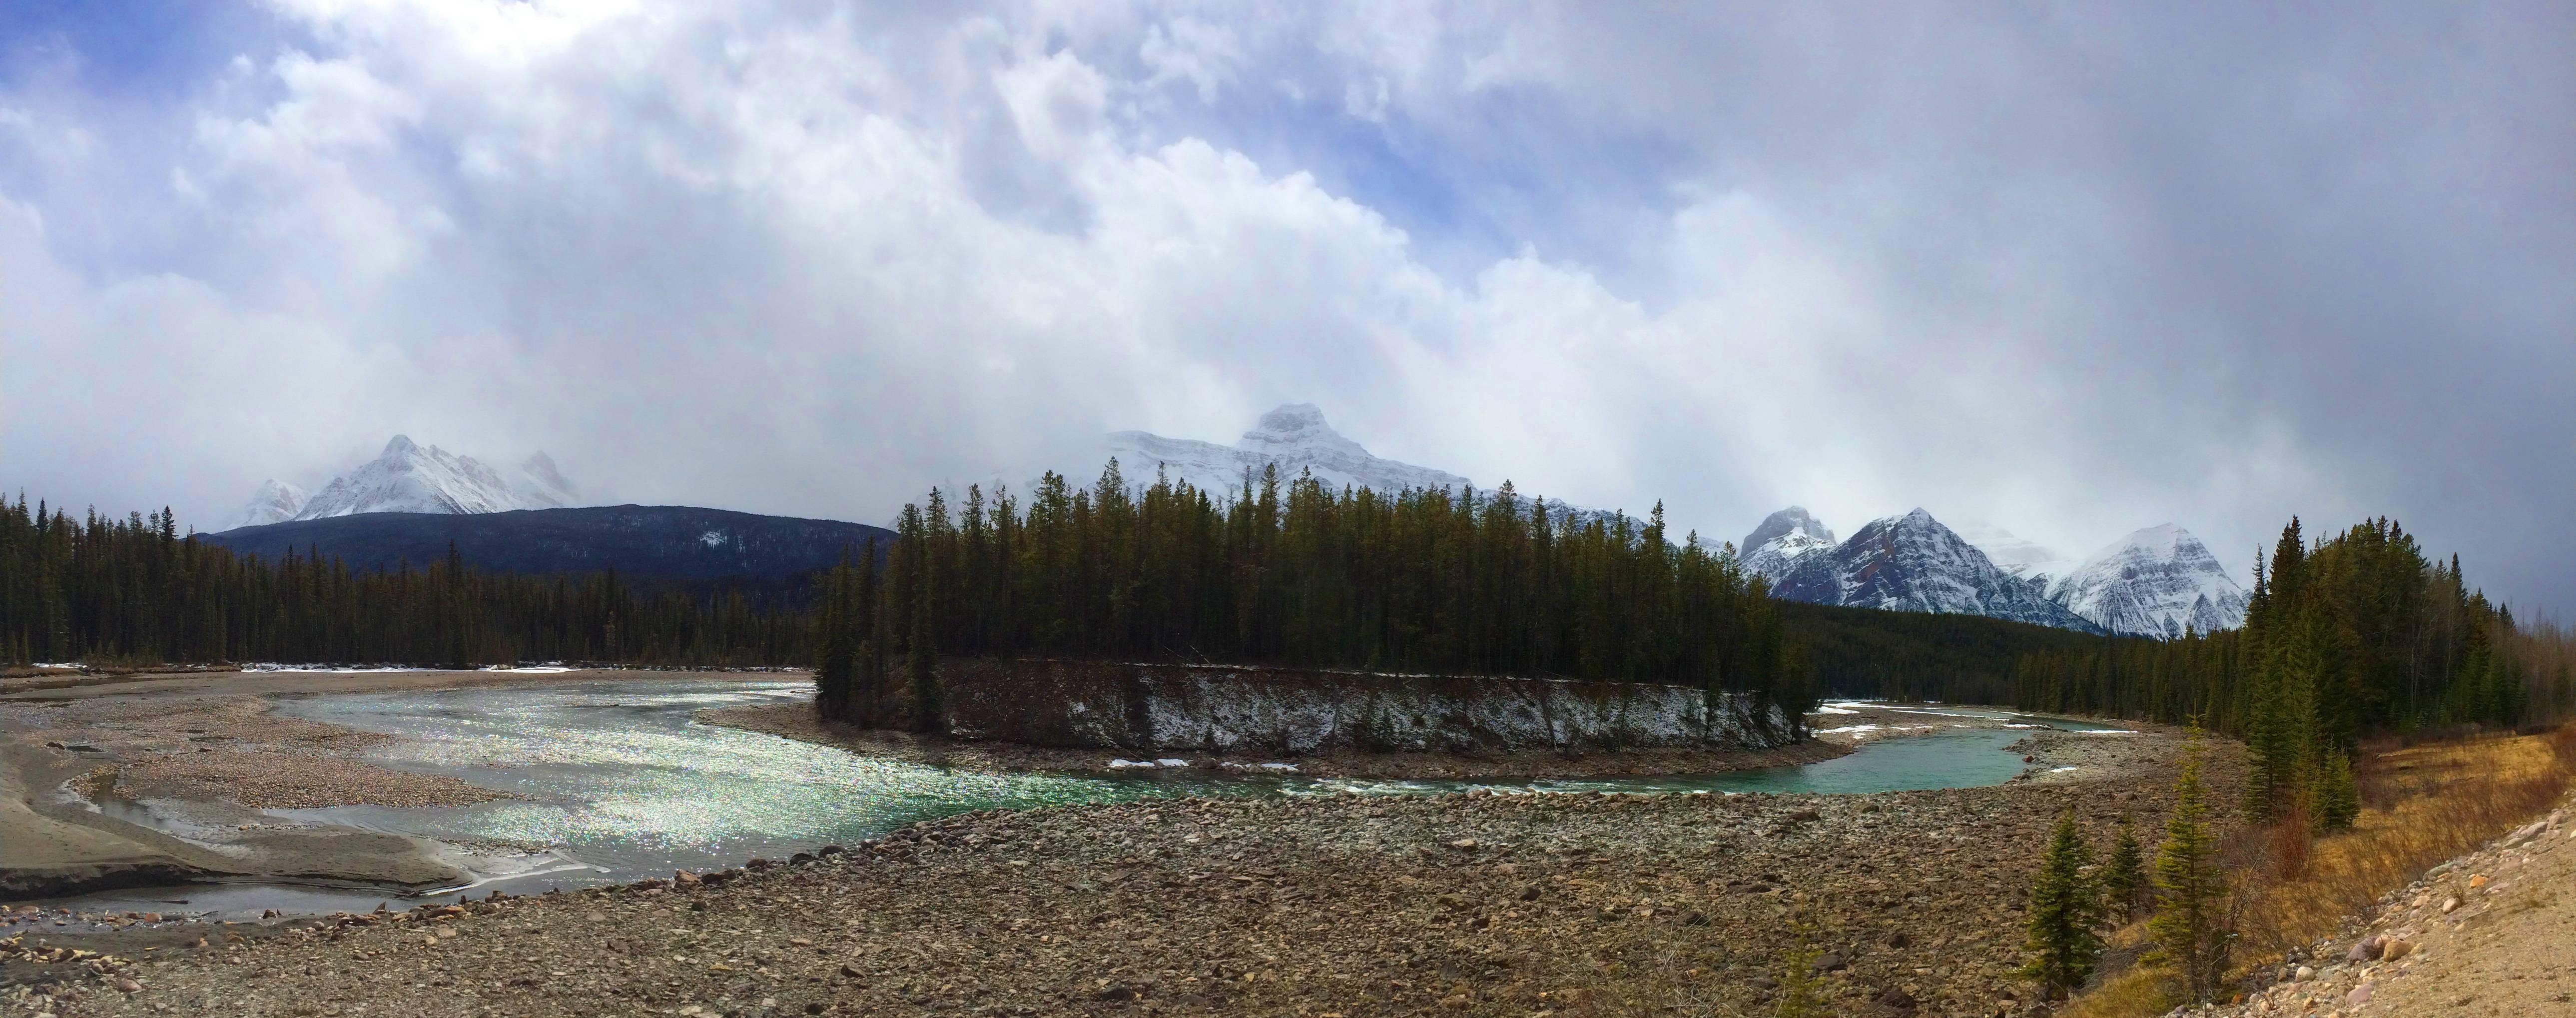 Photo 3: Les rocheuses canadiennes -